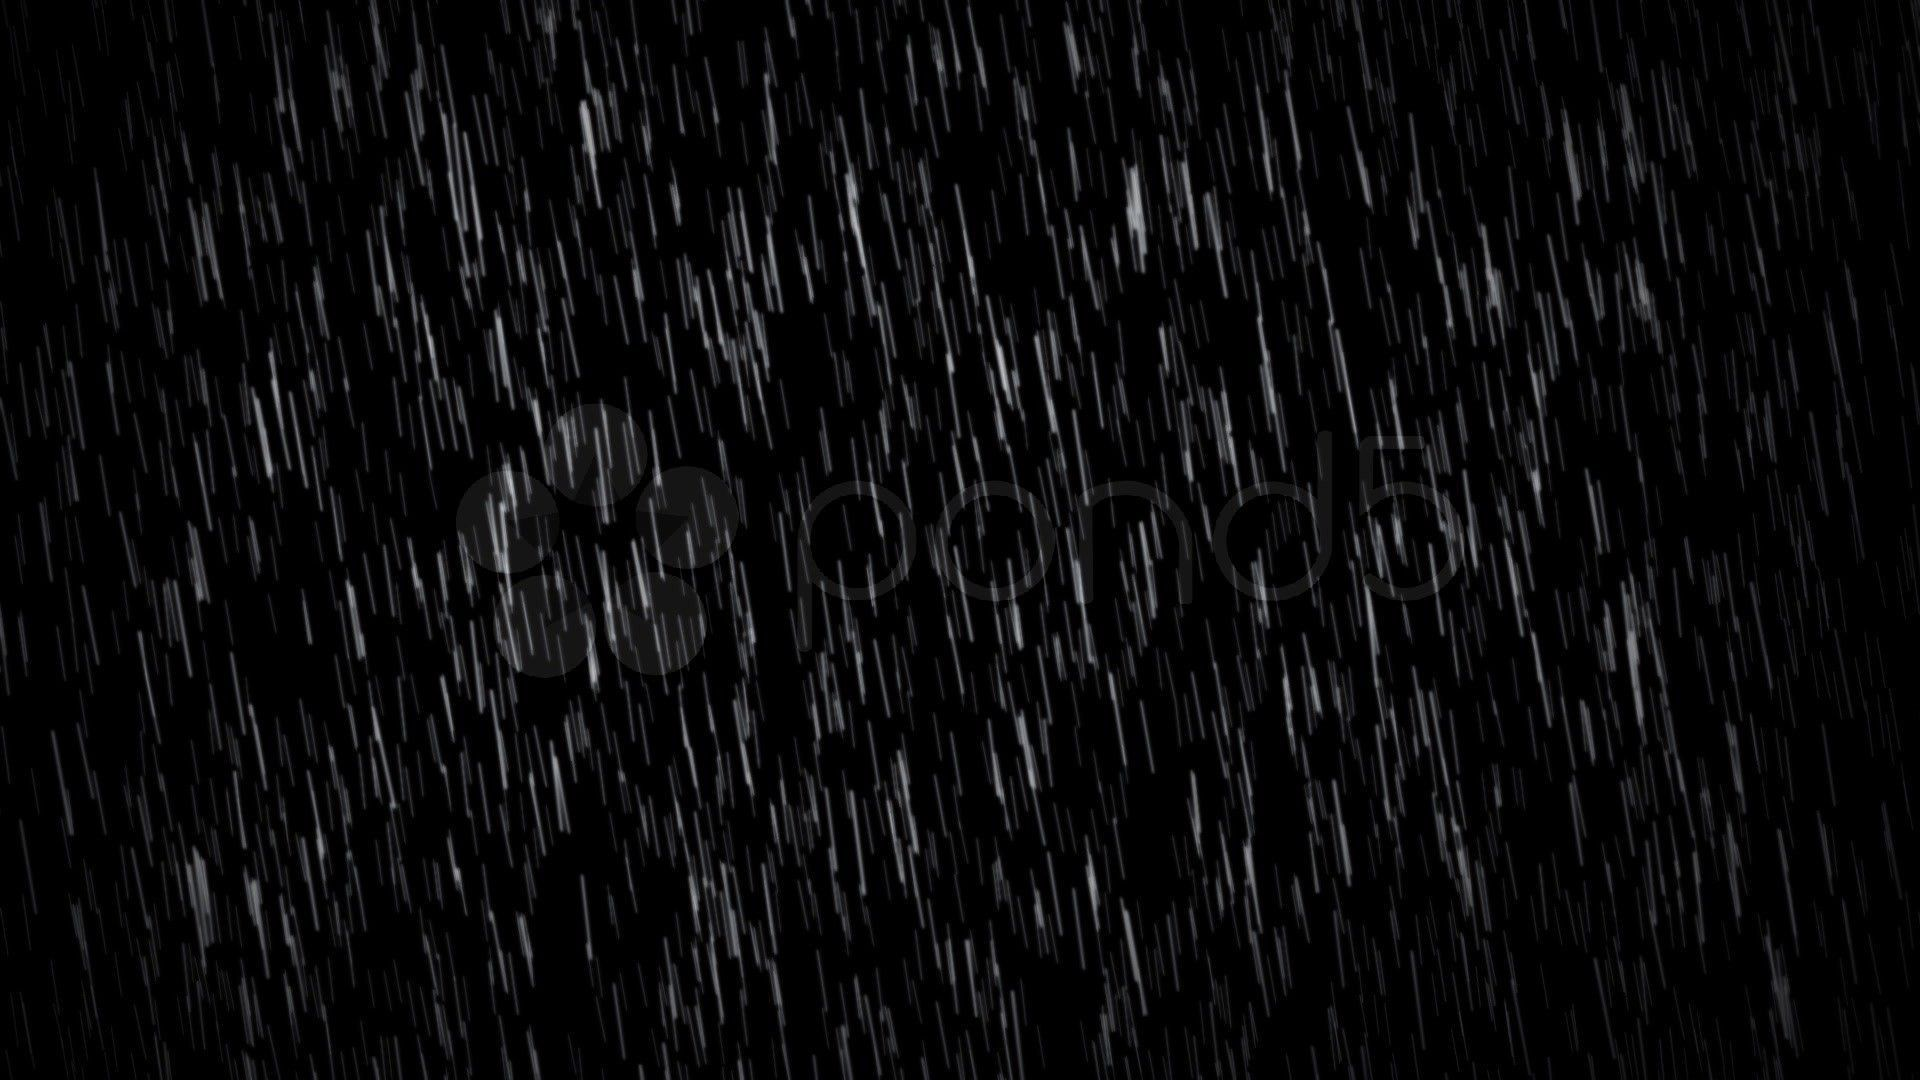 Dark Rain Wallpapers Top Free Dark Rain Backgrounds